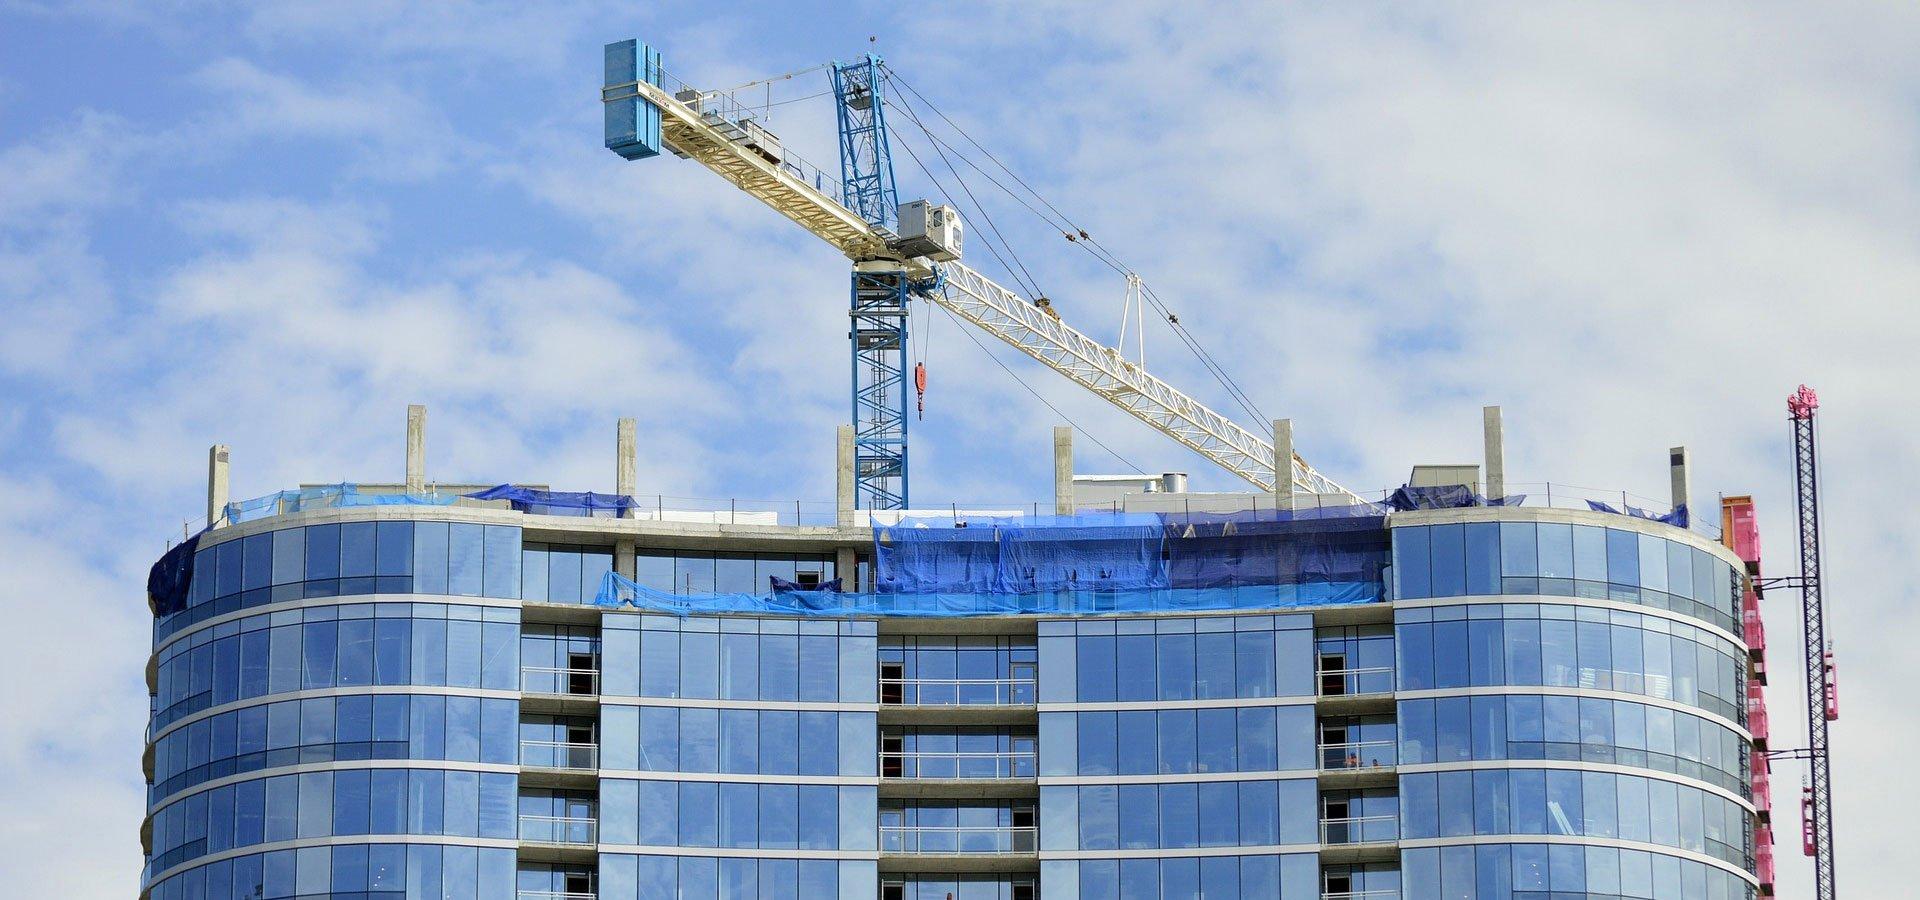 La construction de logements neufs progresse de 6 3 de for Construction de logements neufs